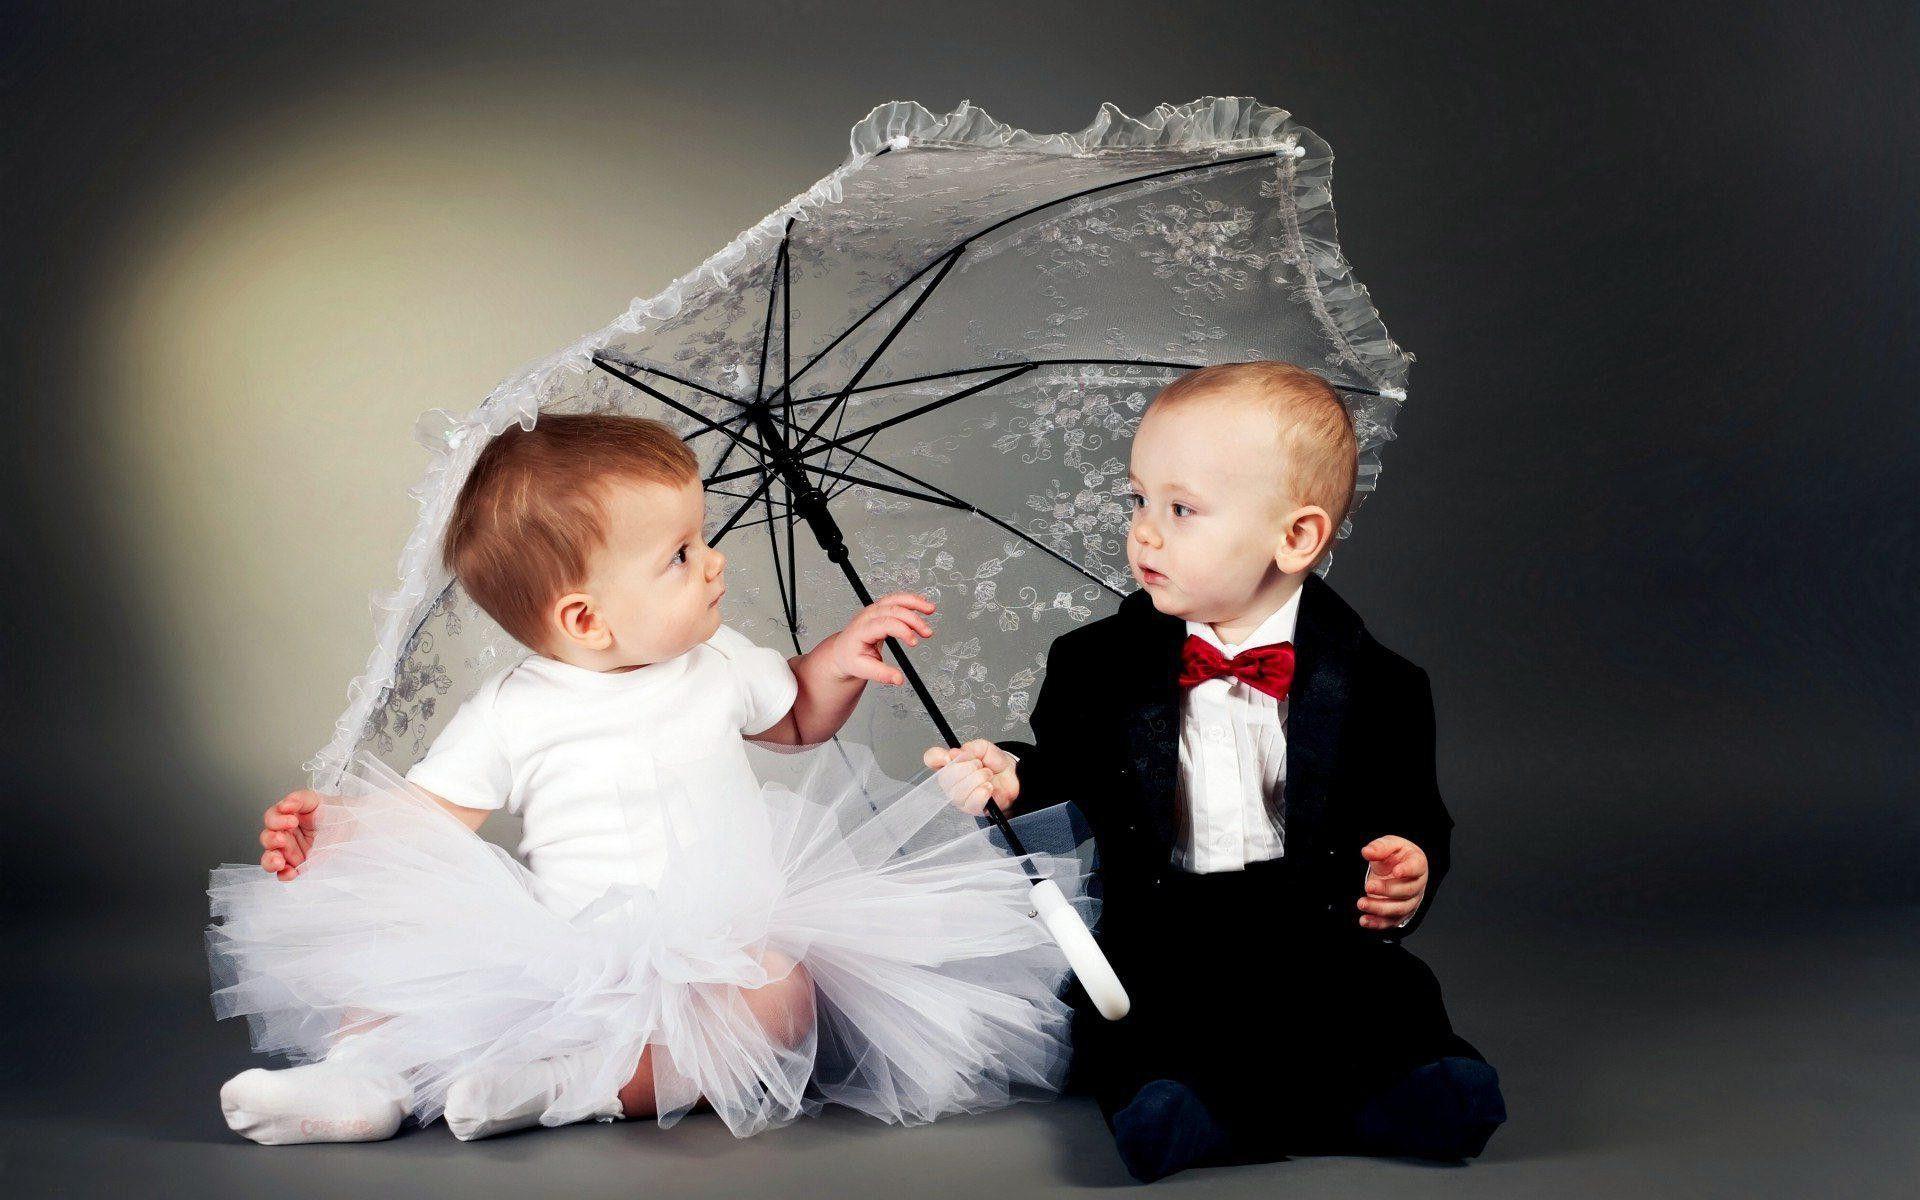 Gentleman Baby In 2021 Cute Baby Couple Cute Baby Wallpaper Love Couple Wallpaper